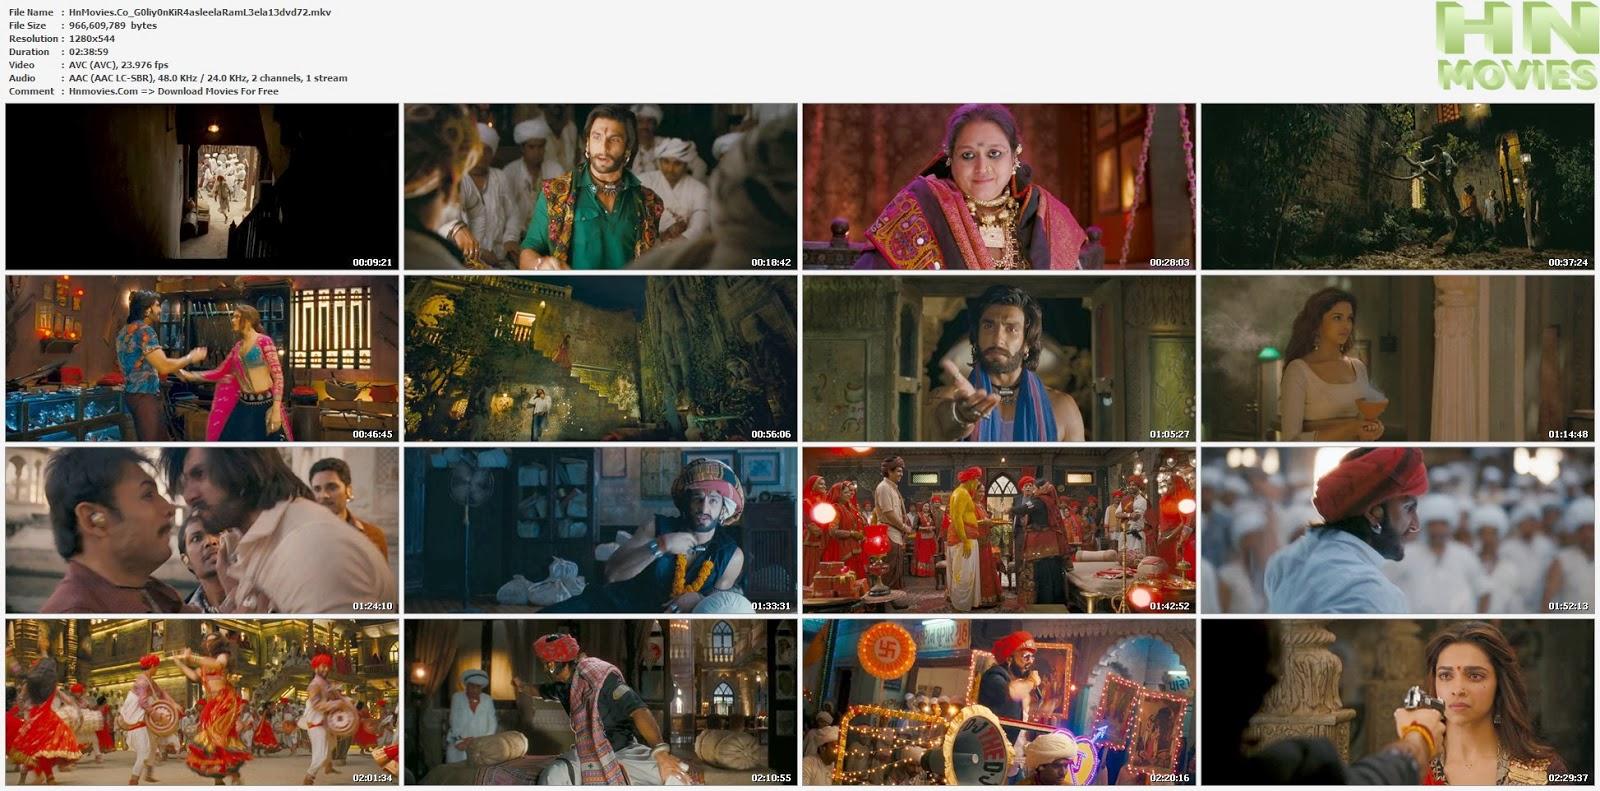 movie screenshot of Goliyon Ki Rasleela Ram-Leela fdmovie.com